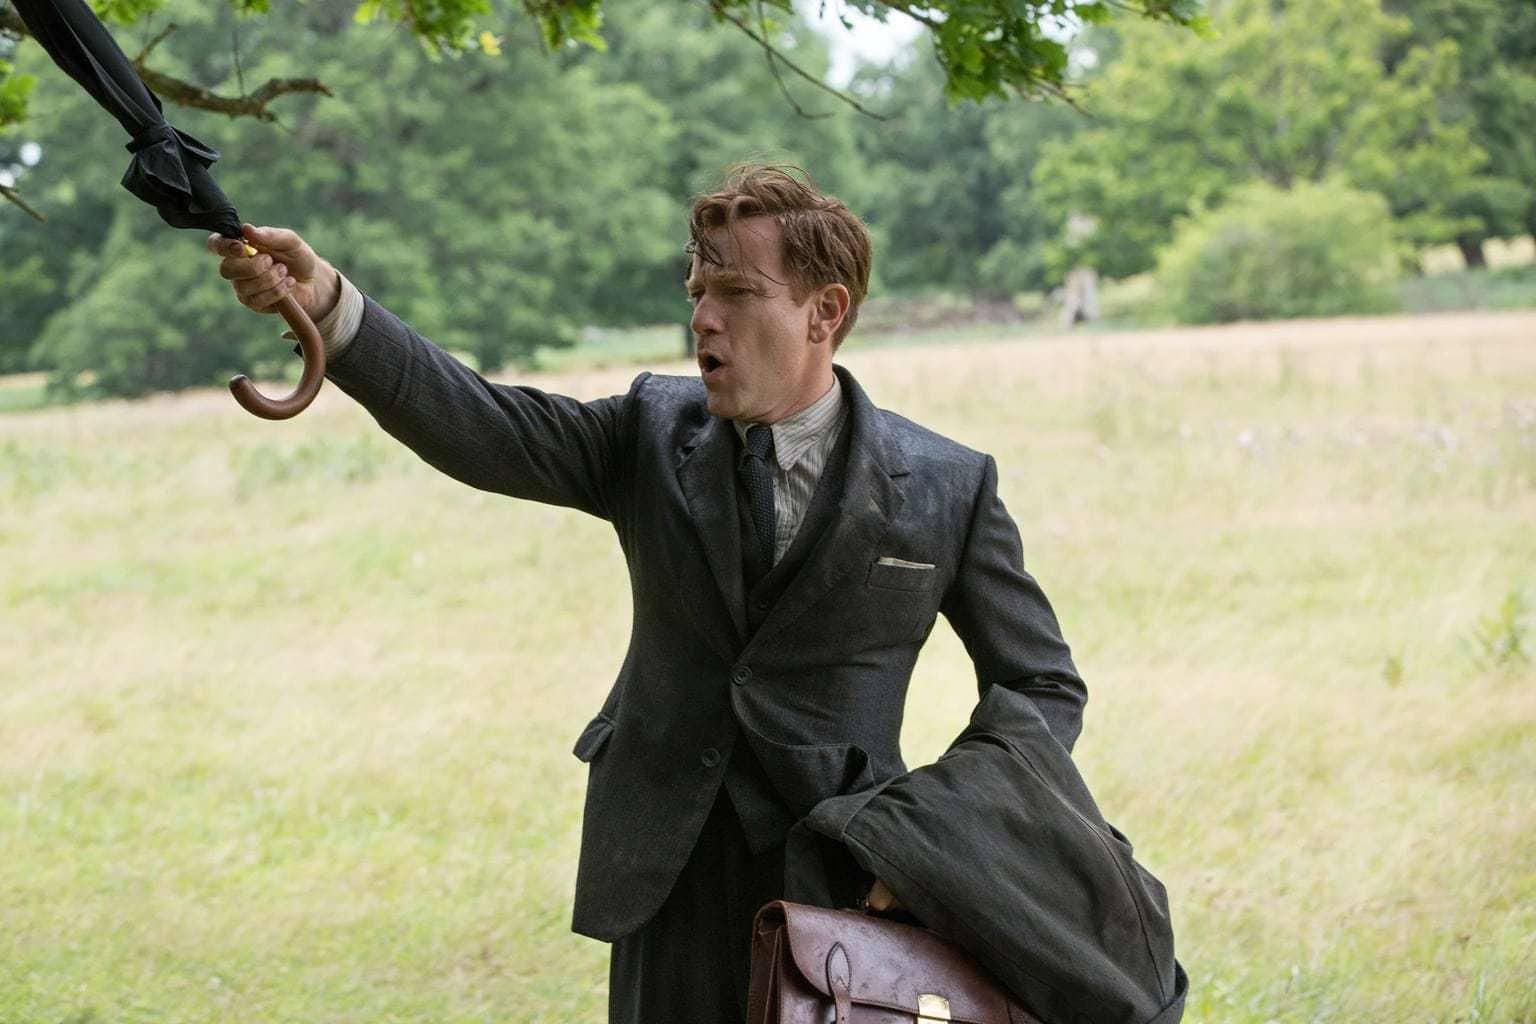 Ewan McGregor is Christopher Robin in Disney's live-action adventure CHRISTOPHER ROBIN.